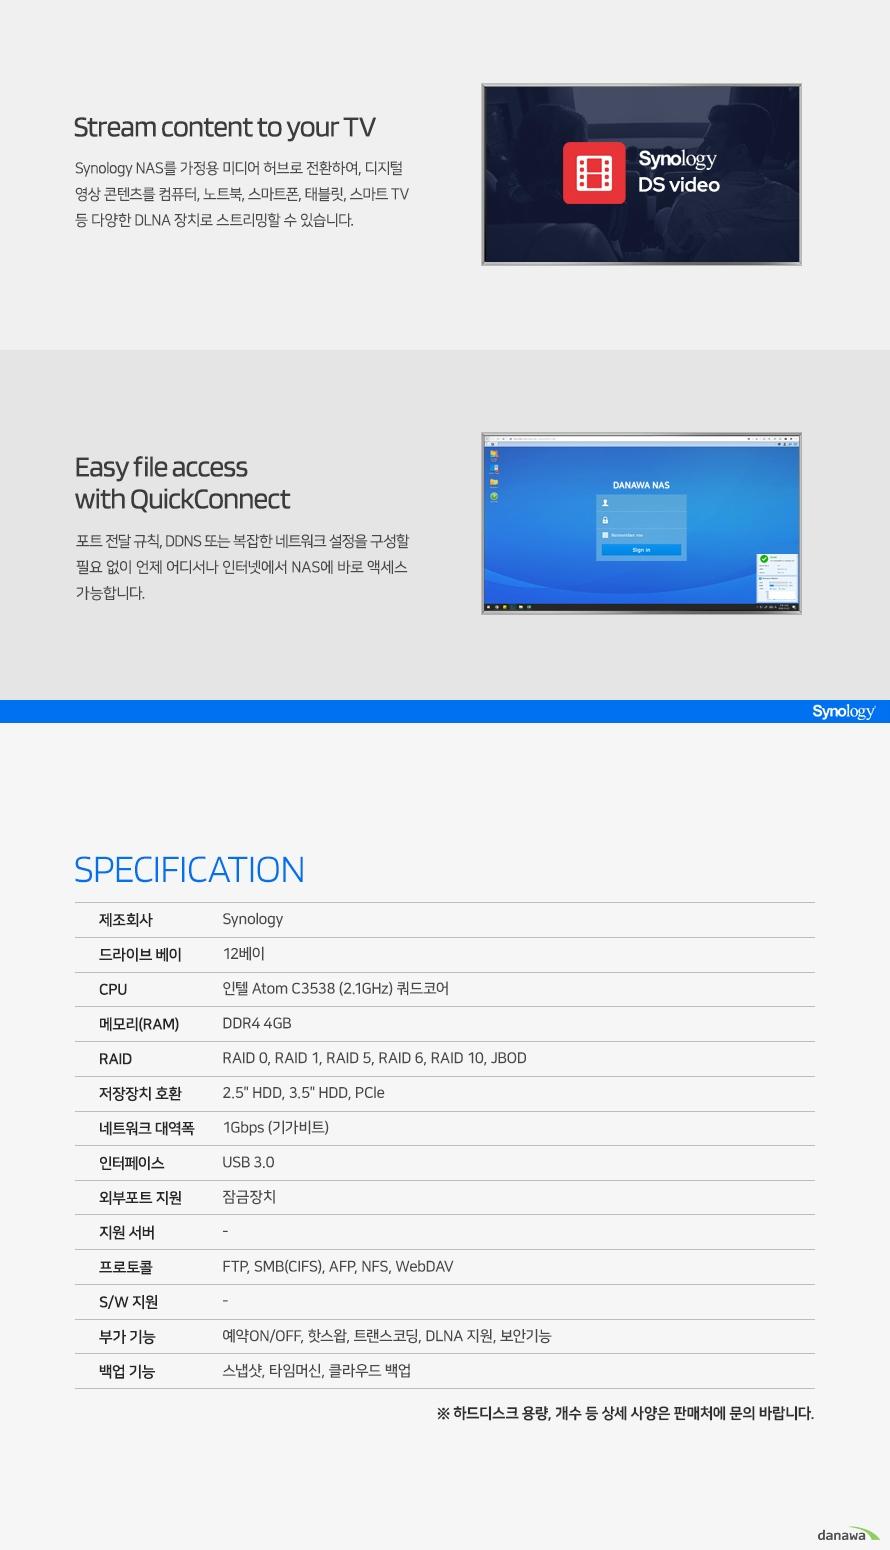 NAS Cloud Server DiskStation DS2419+ RAM 4GB compact personal cloud Synology DiskStation Manager (DSM) Synology가 개발한 웹 기반 운영체제인 DiskStation Manager (DSM)는 직관적인 인터페이스로 사용자가 더욱 편리하게 데이터를 관리할 수 있도록 도와줍니다. 서버가 항상 최상의 상태로 가동되도록 실시간으로 관리하며 철저한 이중 보안 기능으로 사용자의 귀중한 데이터를 보호하고 어떤 상황에서도 데이터를 보존할 수 있도록 강력한 백업 기능을 지원합니다. Versatile in feature 이동 중에서도 파일에 액세스하고 안전한 파일 전송 공유 기능을 제공하는 큐브형 NAS 제품입니다. 스마트하고 안정적인 파트너로, 모든 사진, 비디오 및 파일을 체계적으로 정리합니다. CPU 인텔 Atom C3538 2.1GHz 쿼드코어 Memory DDR4 4GB Network 1Gbps 기가비트 이더넷 Scalability 2.5